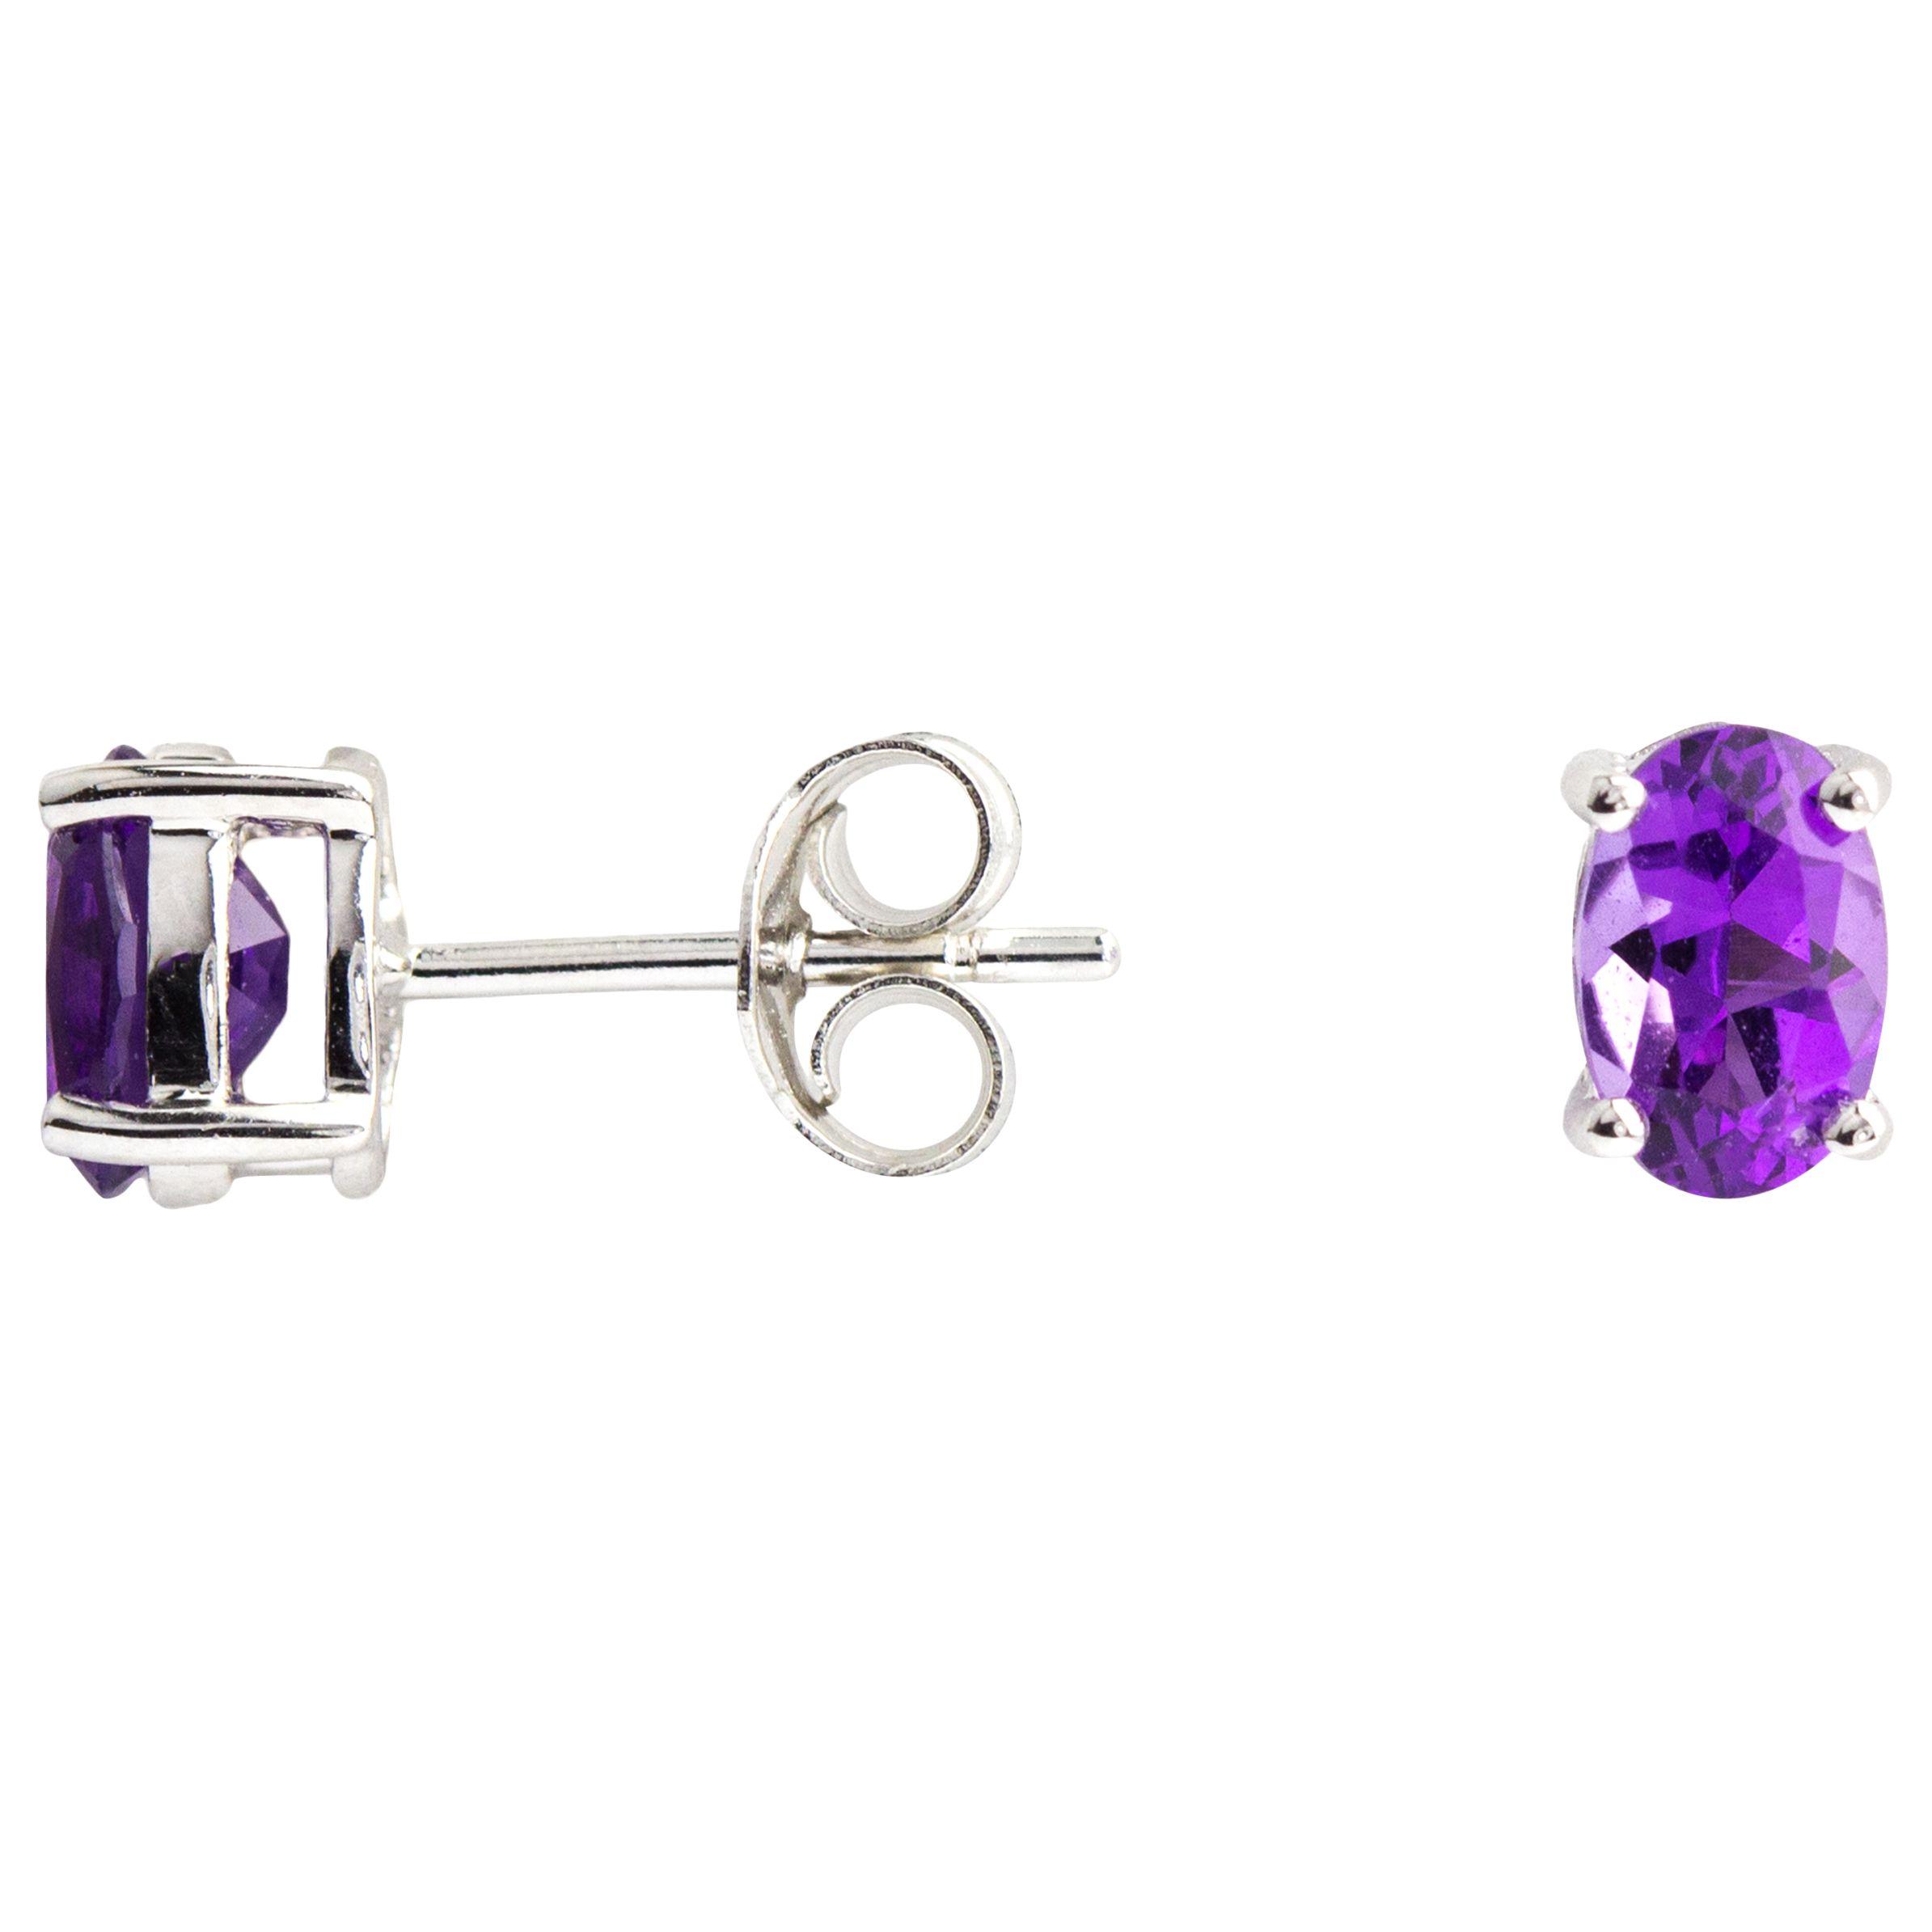 A B Davis A B Davis 9ct White Gold Amethyst Oval Claw Set Stud Earrings, Purple